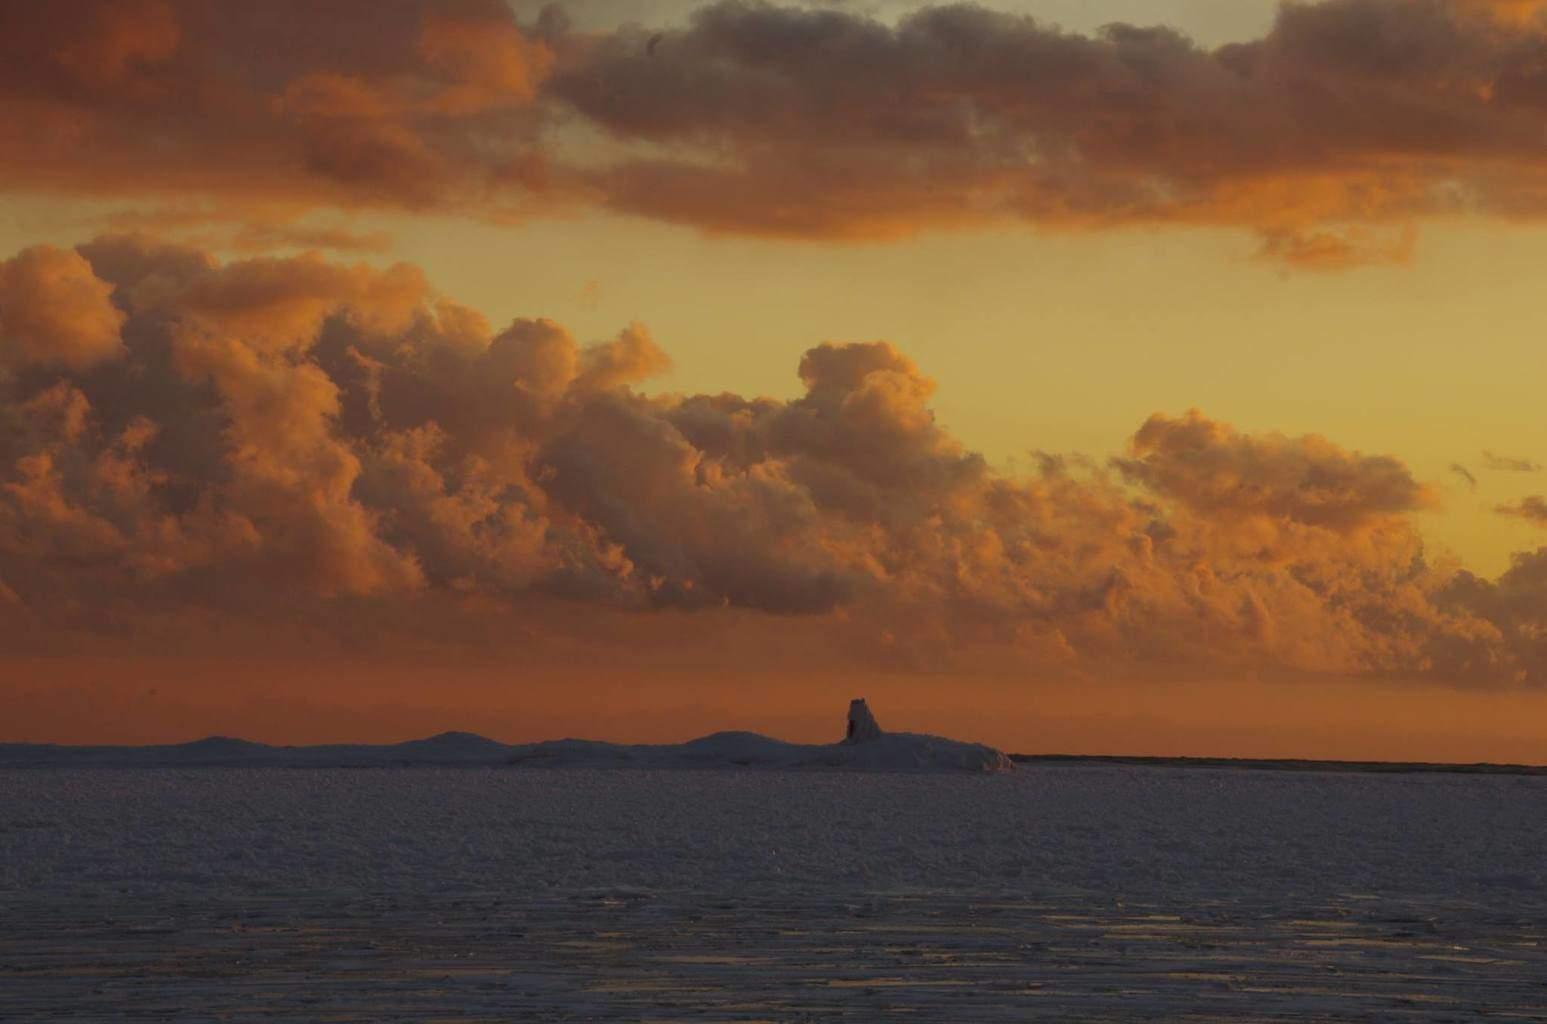 Sun lit clouds tonight at sunset.